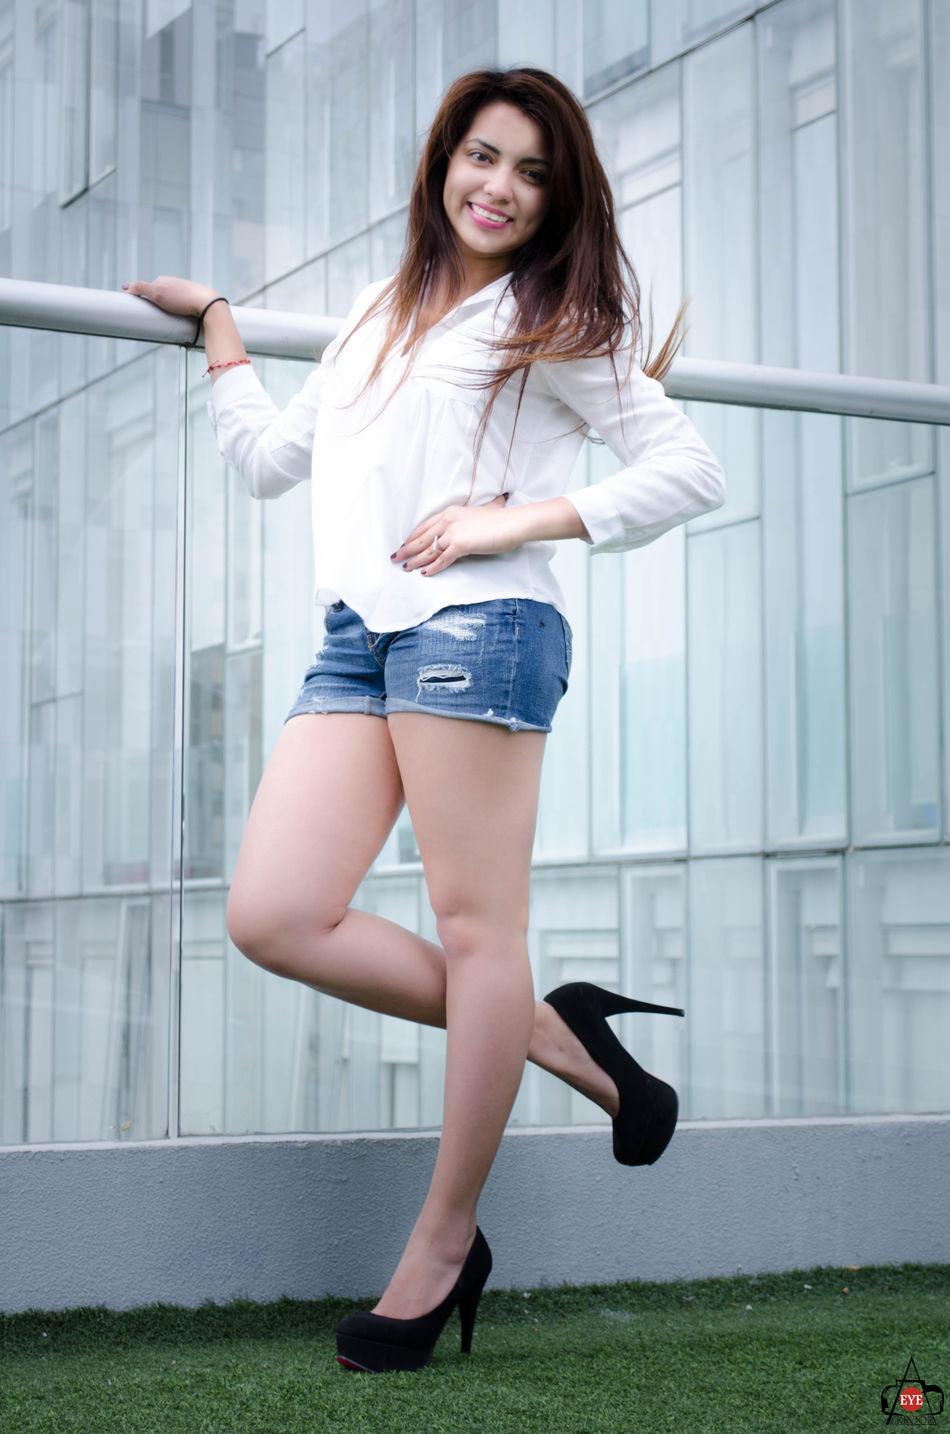 Amazing Body & Fitness Fashion Fashion&love&beauty Fashionable Girlsfashion Legs Long Hair LongLegs♡ Magazine Mexican Mexicana Mexico City Model Modeling Polancodf Residencial Sensuality Sexygirl Sexylegs Shorts Tacones Altos Young Women